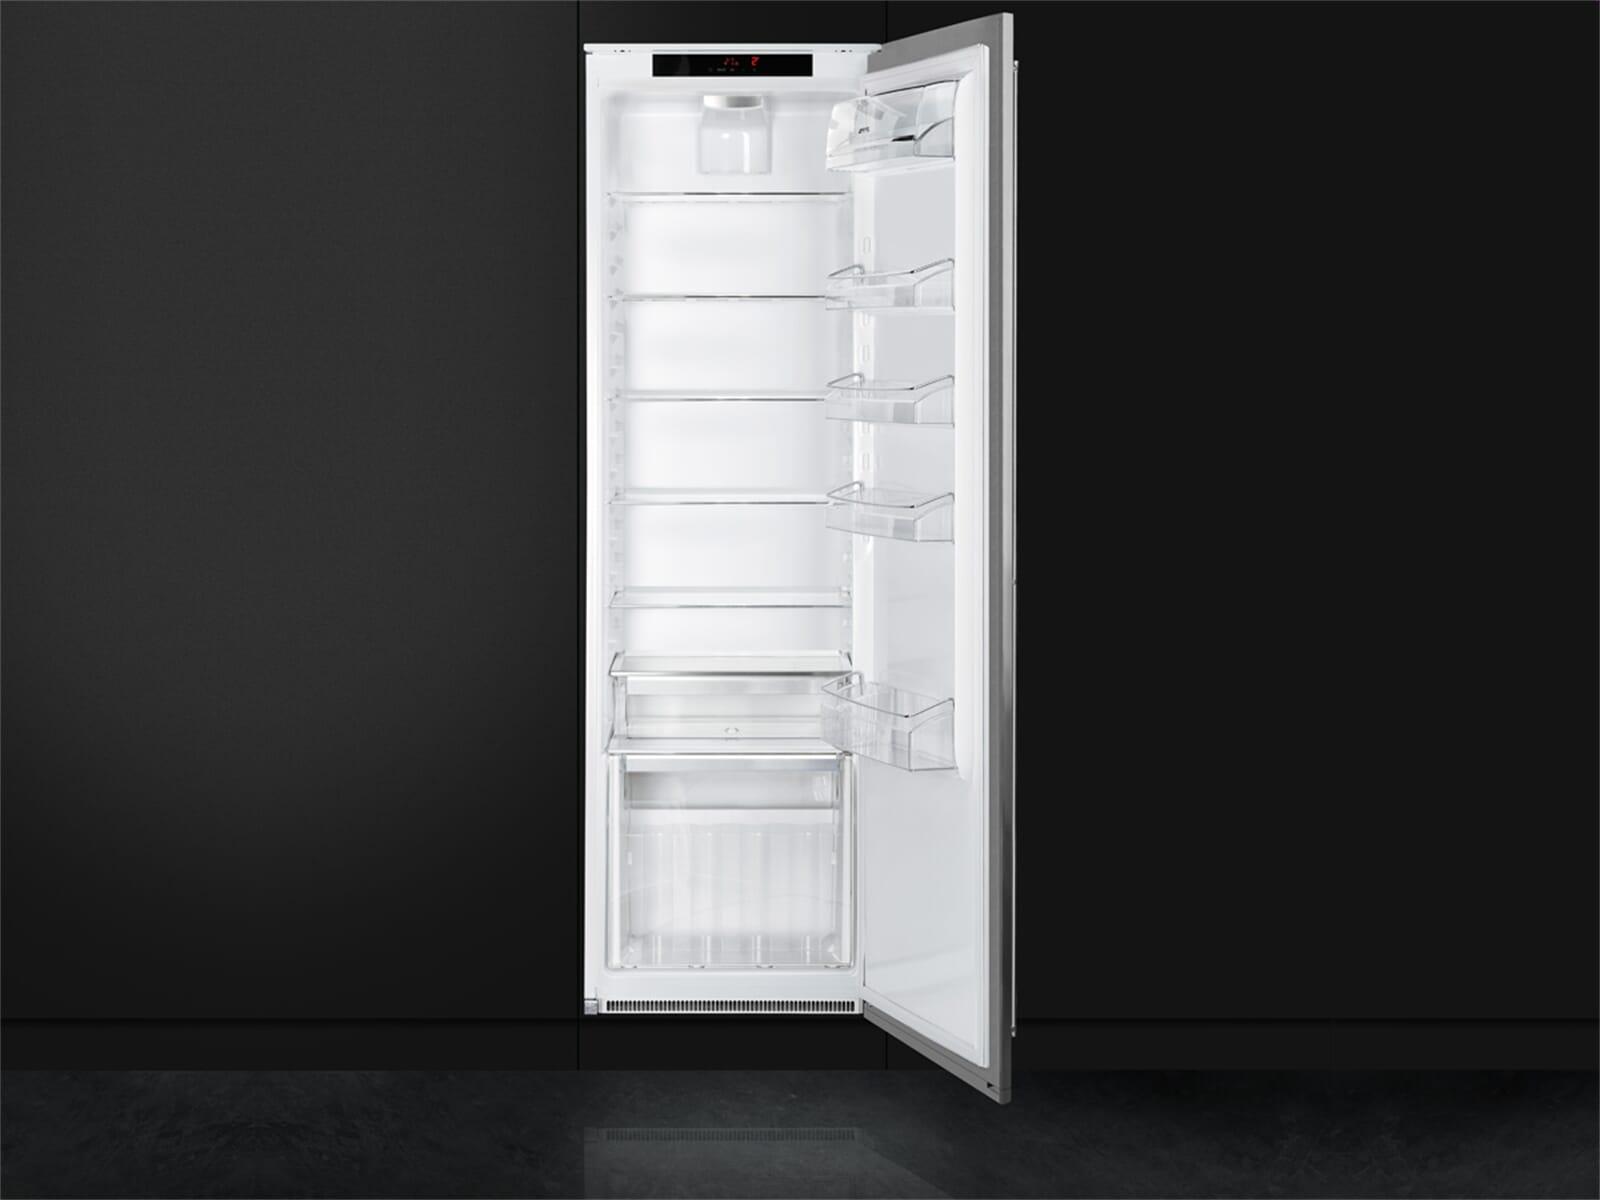 Siemens Kühlschrank Holiday Funktion : Smeg ri rx einbaukühlschrank edelstahl